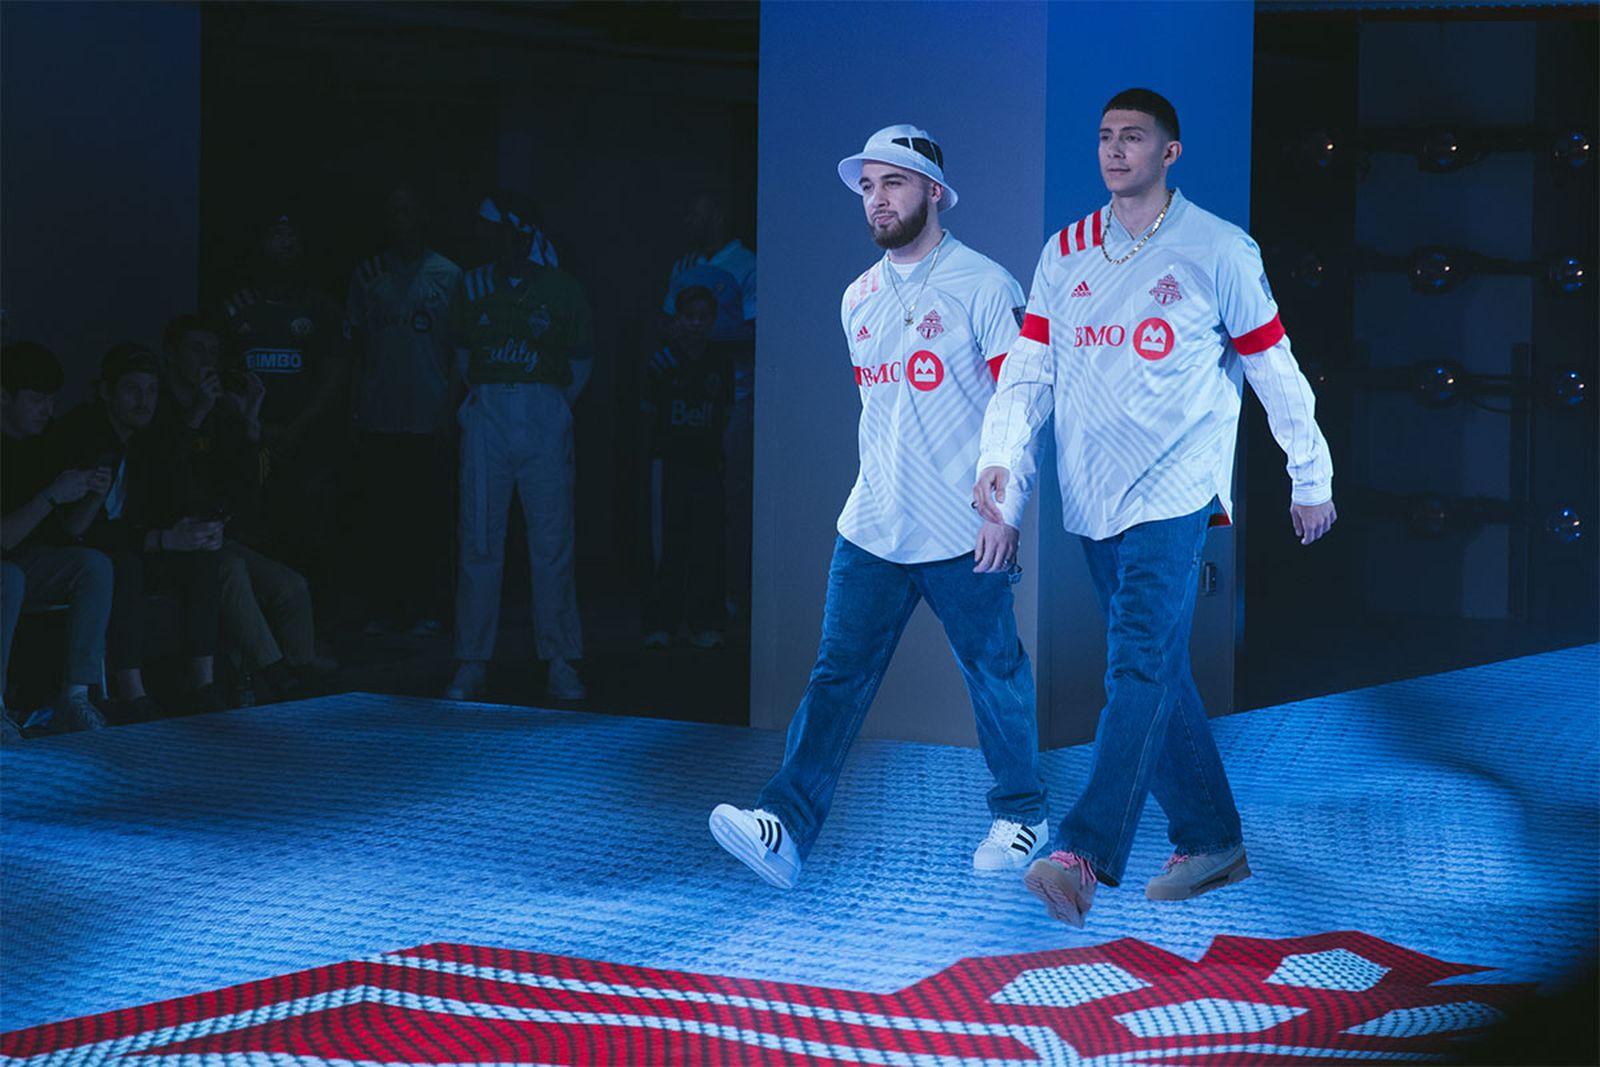 R&B duo Majid Jordan walks the runway for MLS' 2020 jersey unveiling at NYFW: Men's.